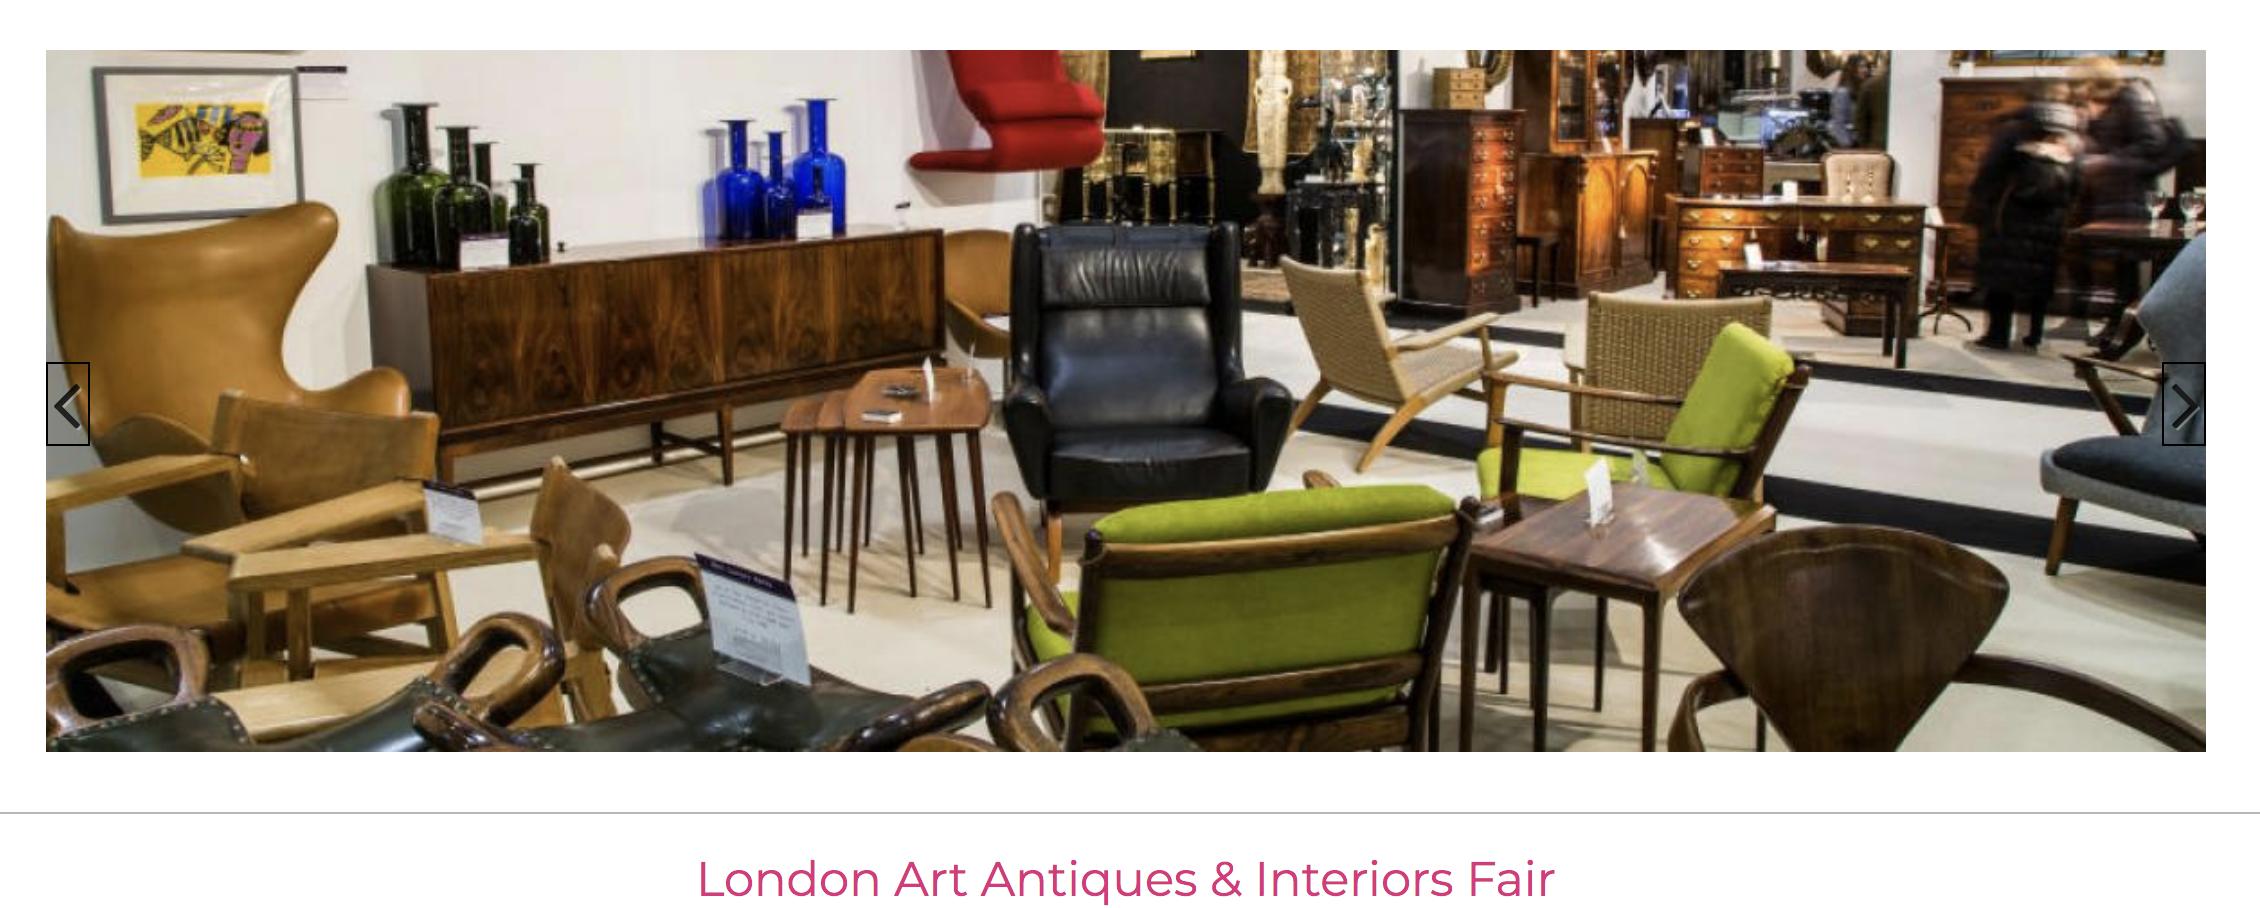 London Art Antiques & Interiors Fair